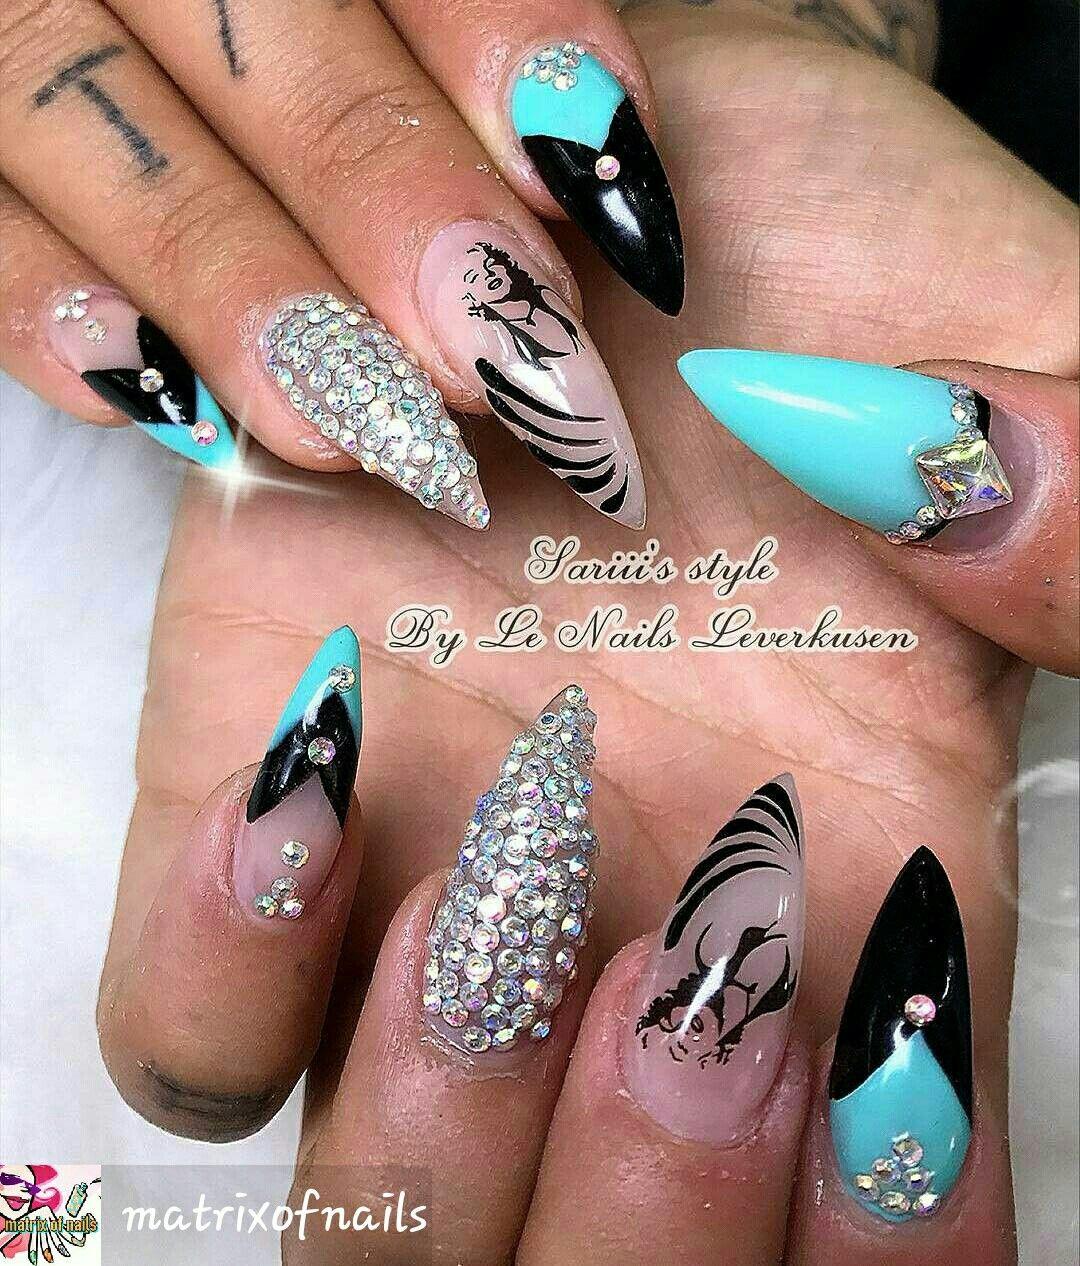 nailtechnails #MarilynMonroe #nailart | Acrylic/Gel Nail Art ...